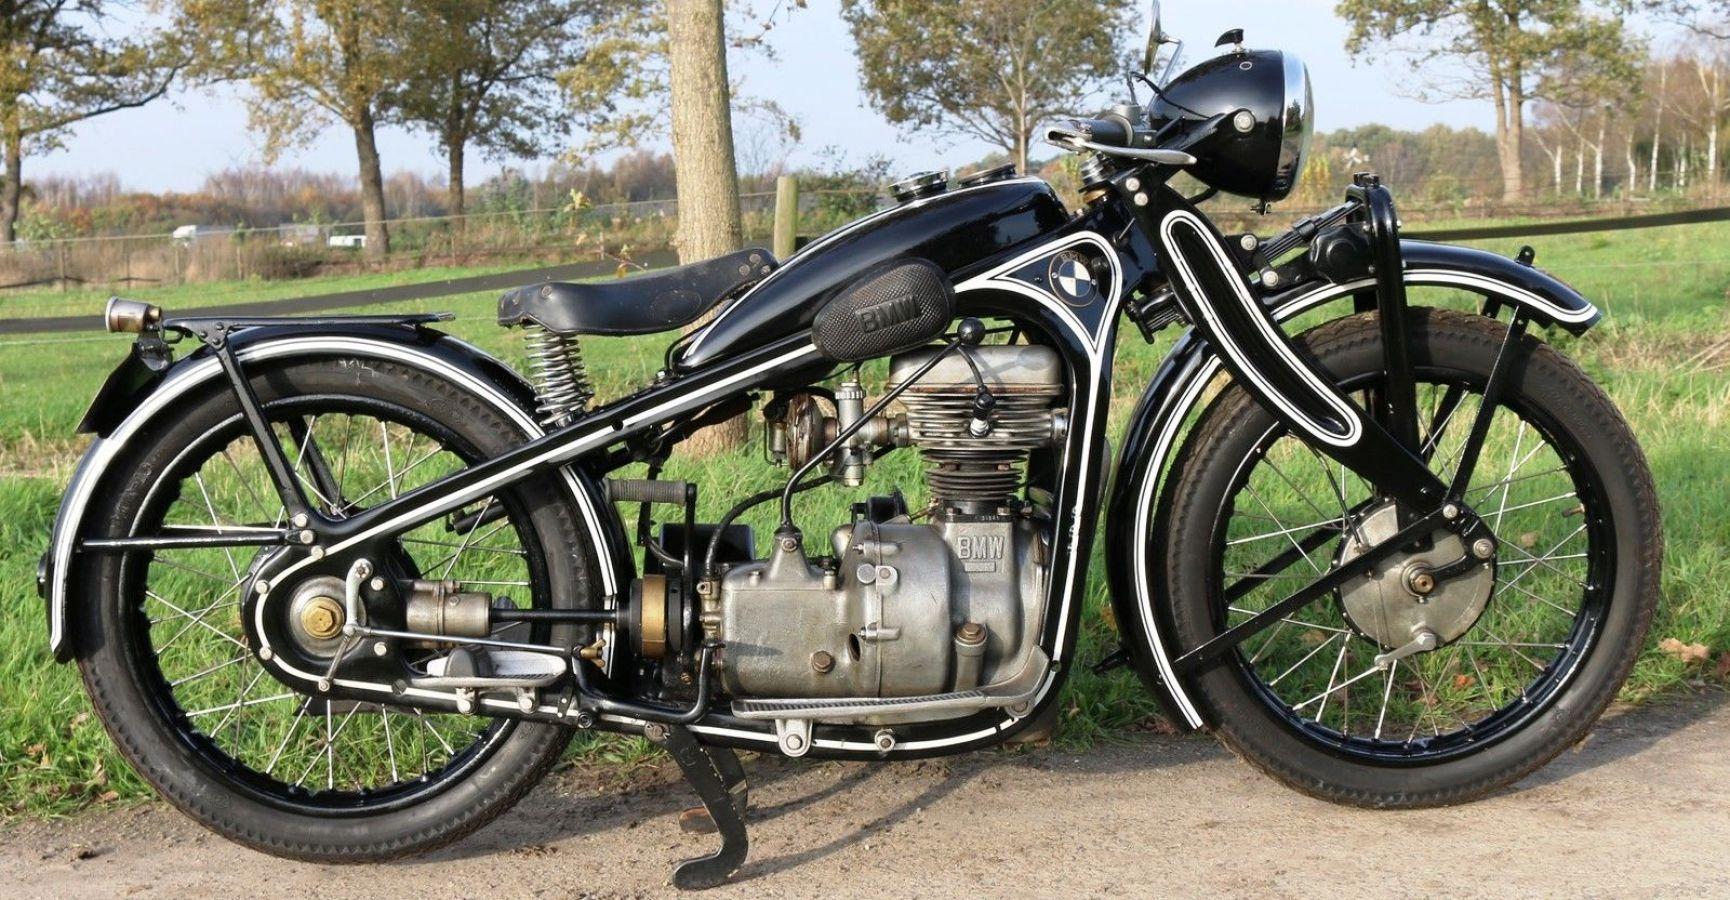 Bmw R2 Year 1935 In Nice Restored Condition Good Runner Bmw